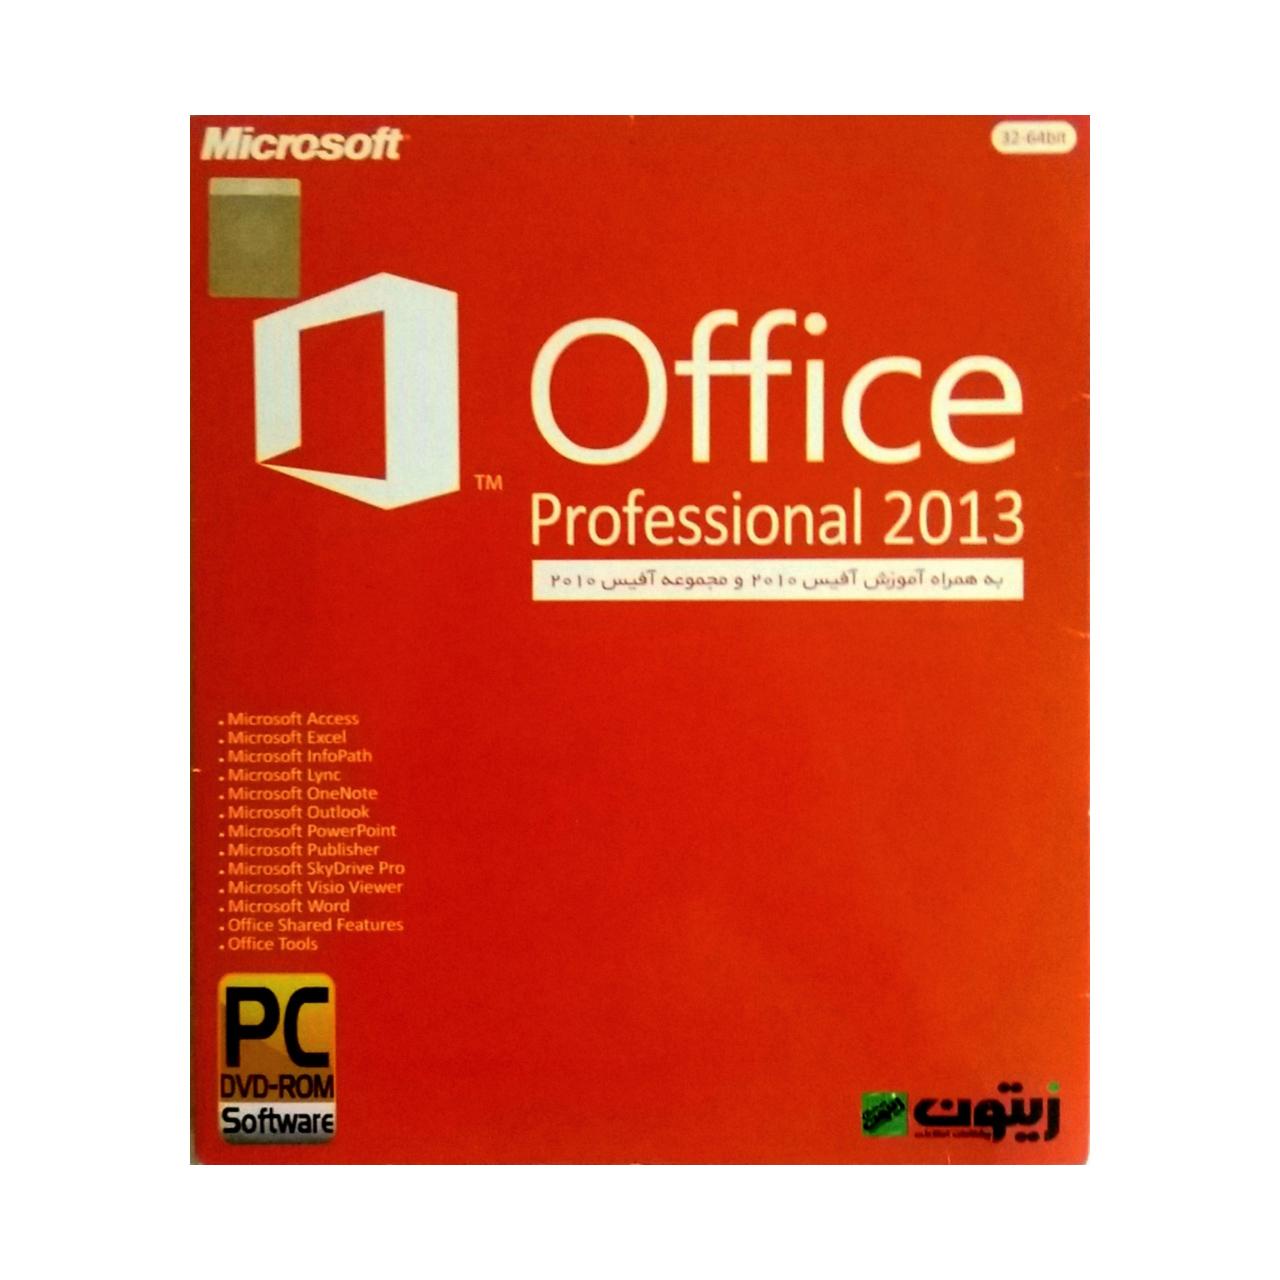 نرم افزار Microsoft Office 2013 نشر زیتون